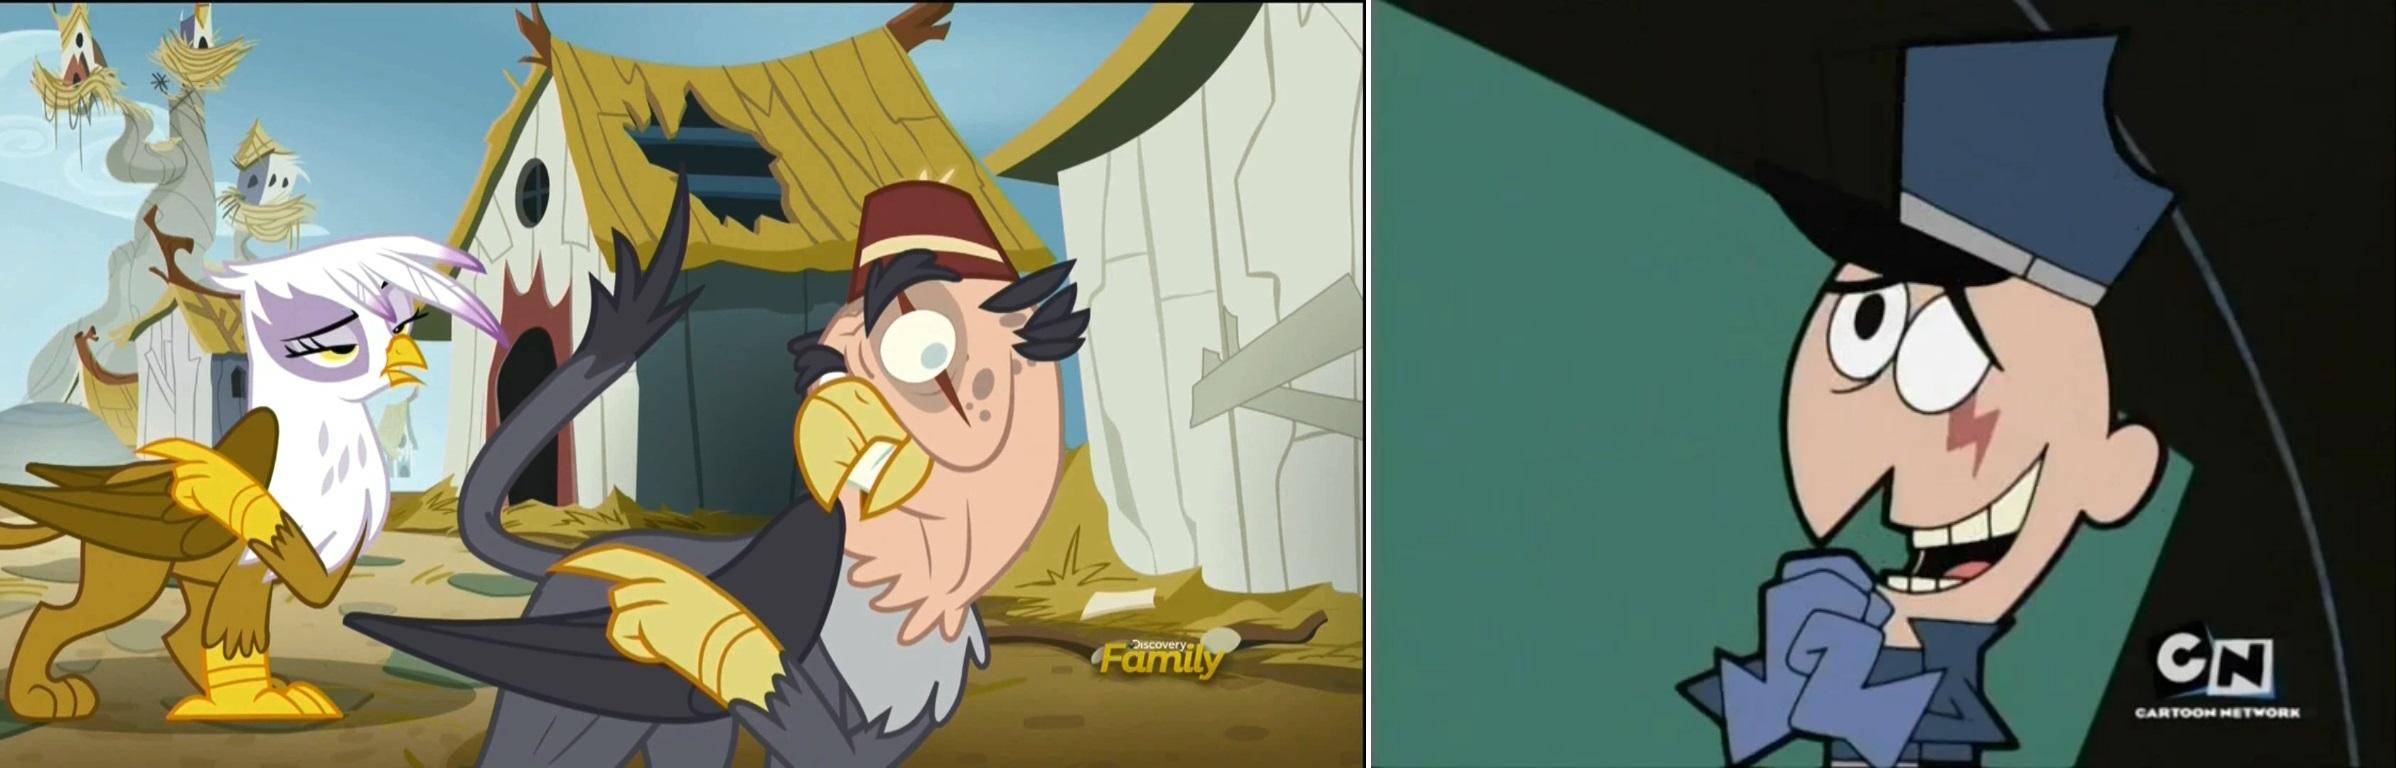 Super Recaps My Little Pony Season 5 The Lost Treasure Of